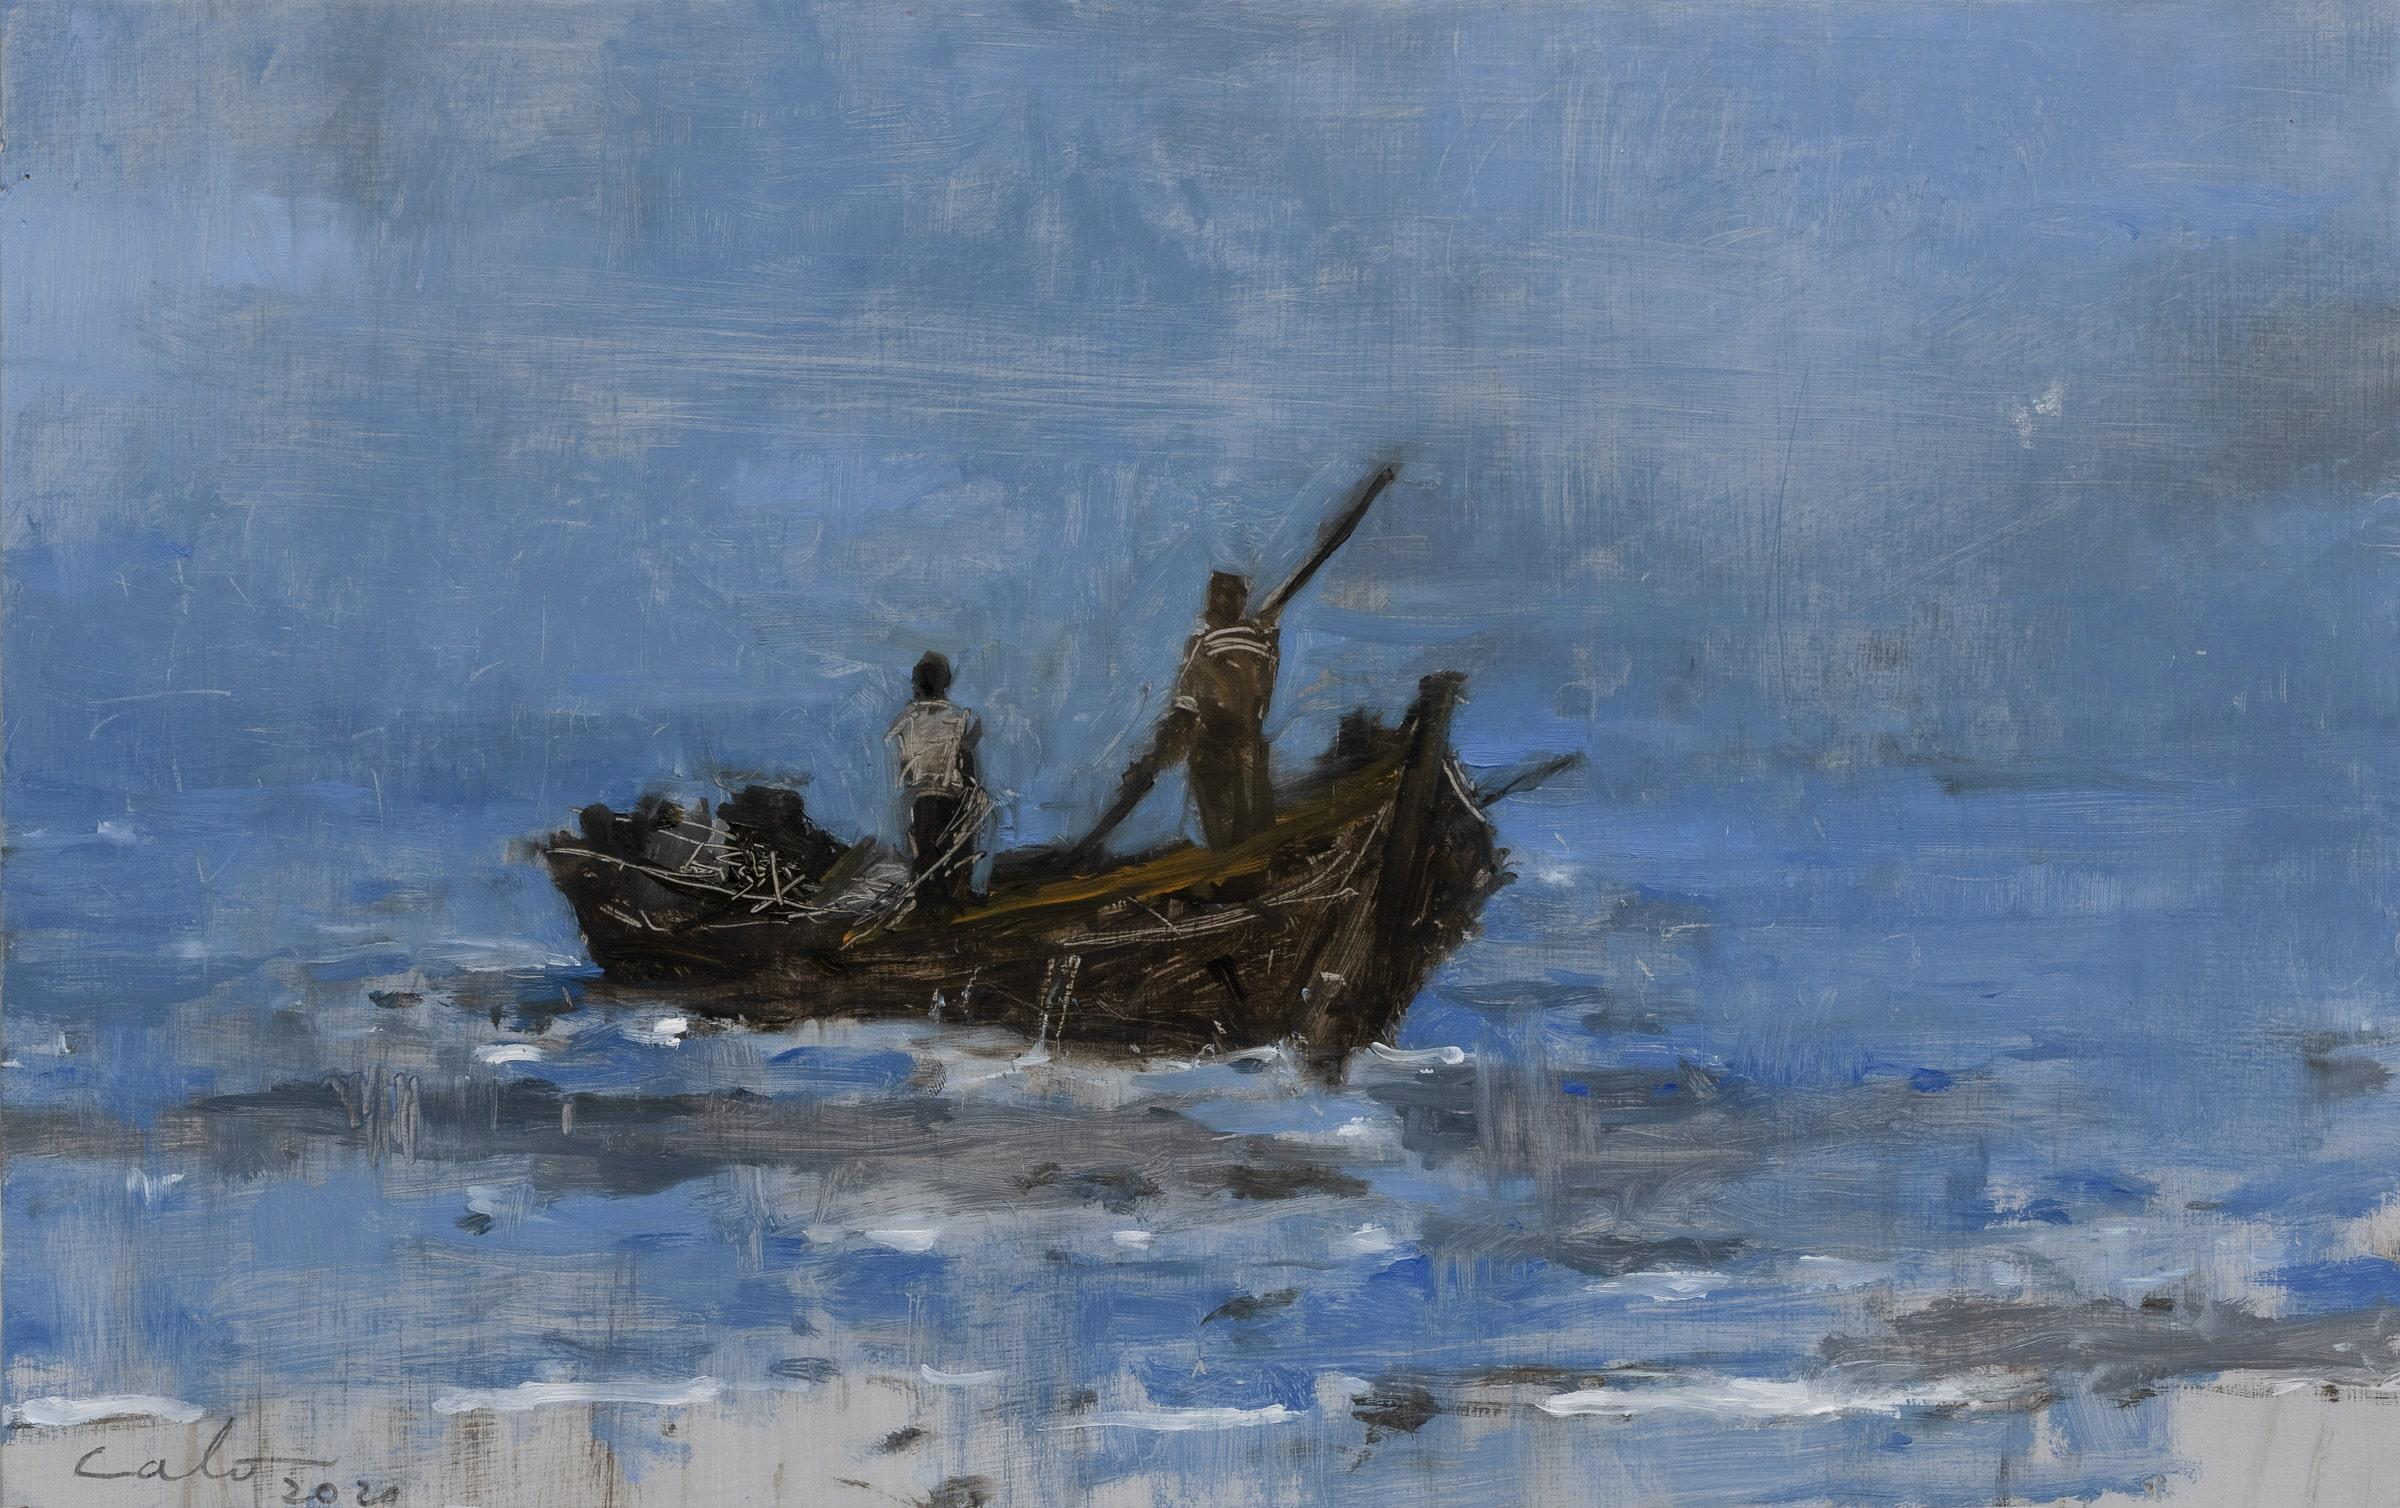 Marinas n°35 (Tanzania) - Landscape Painting